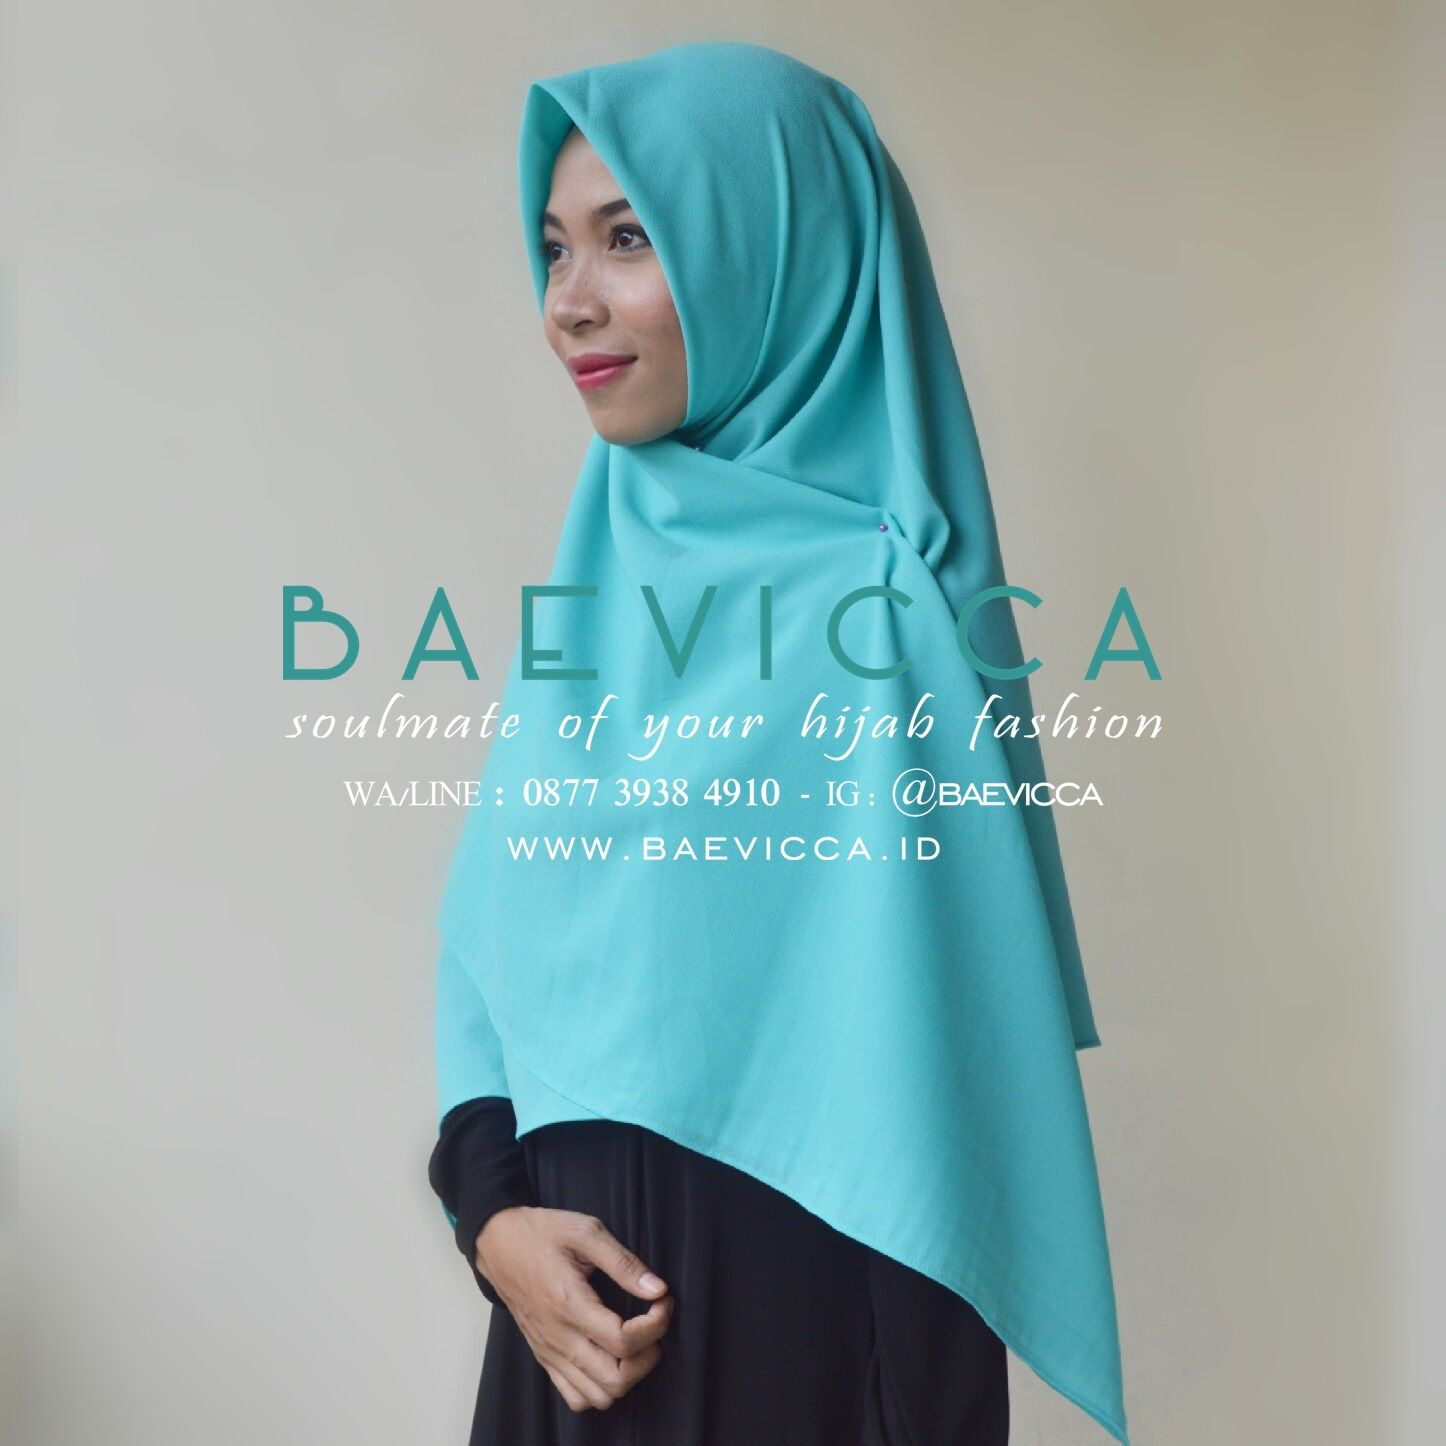 Pashmina Instan Syari Tutorial Jilbab Syari Hijab Syari Pashmina